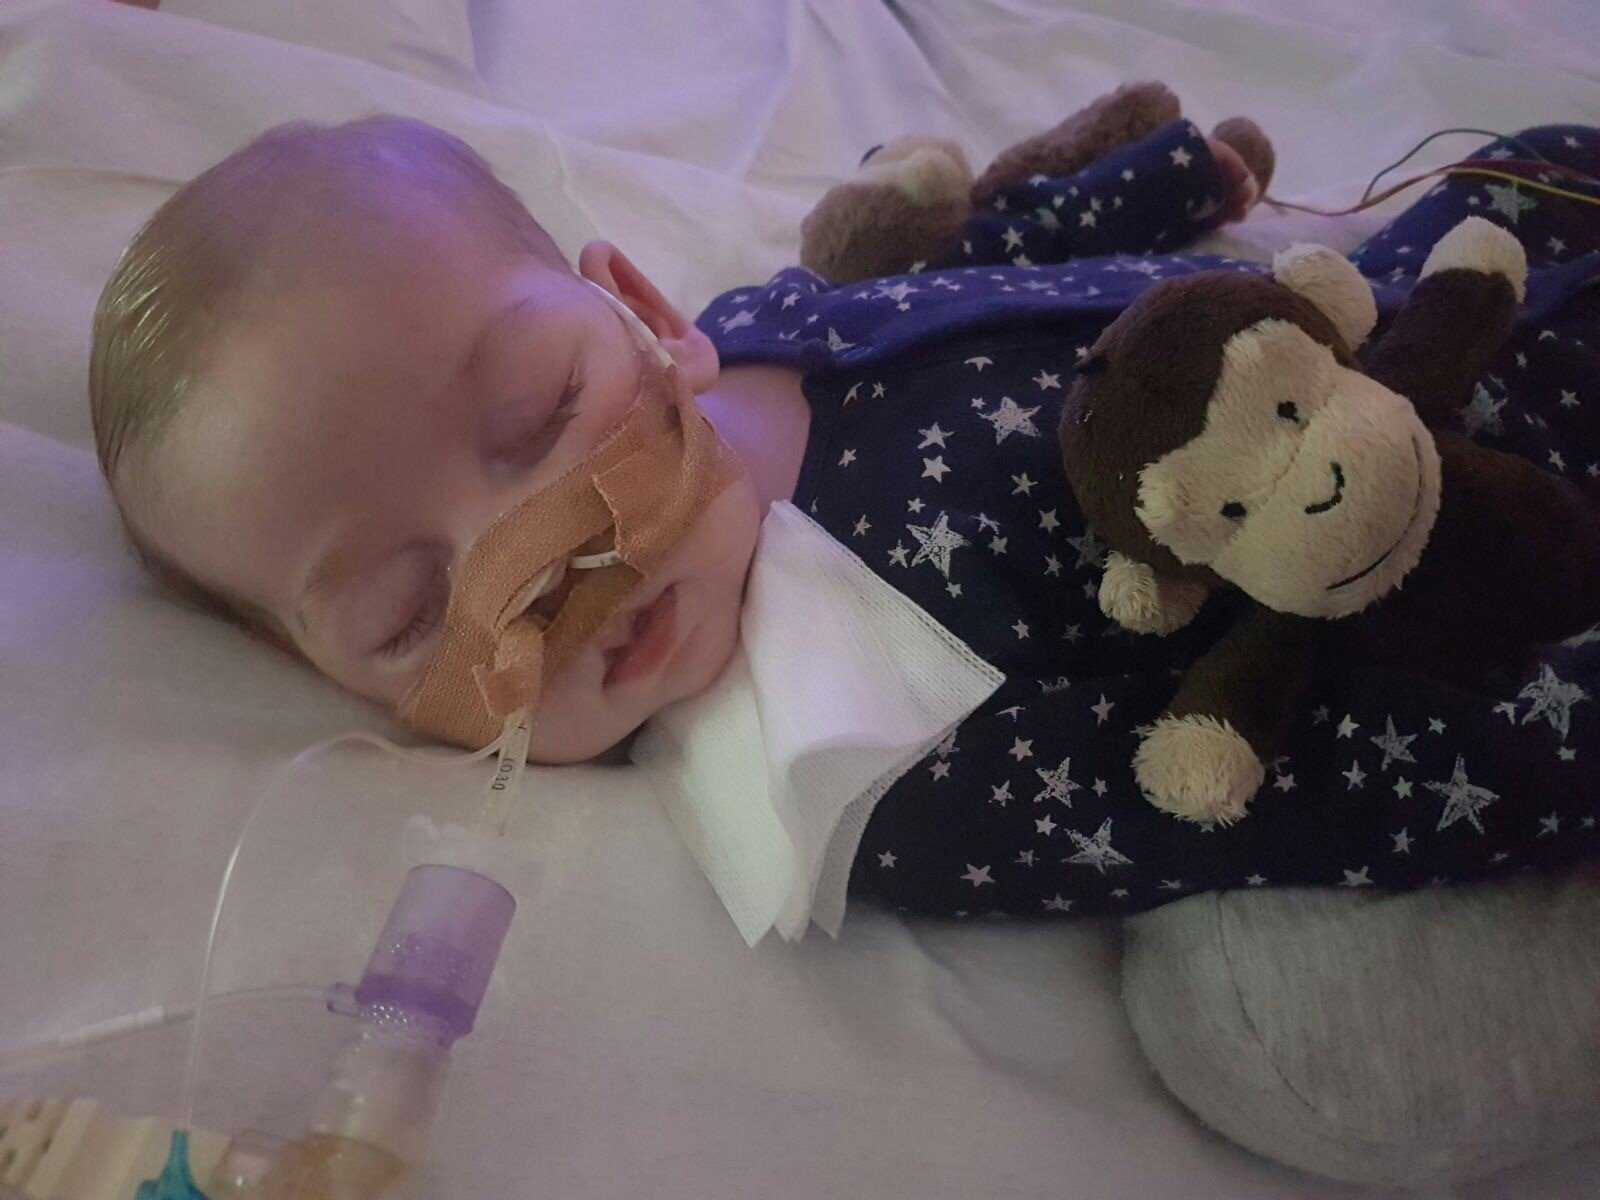 charlie gard terminally ill life support family via cnn